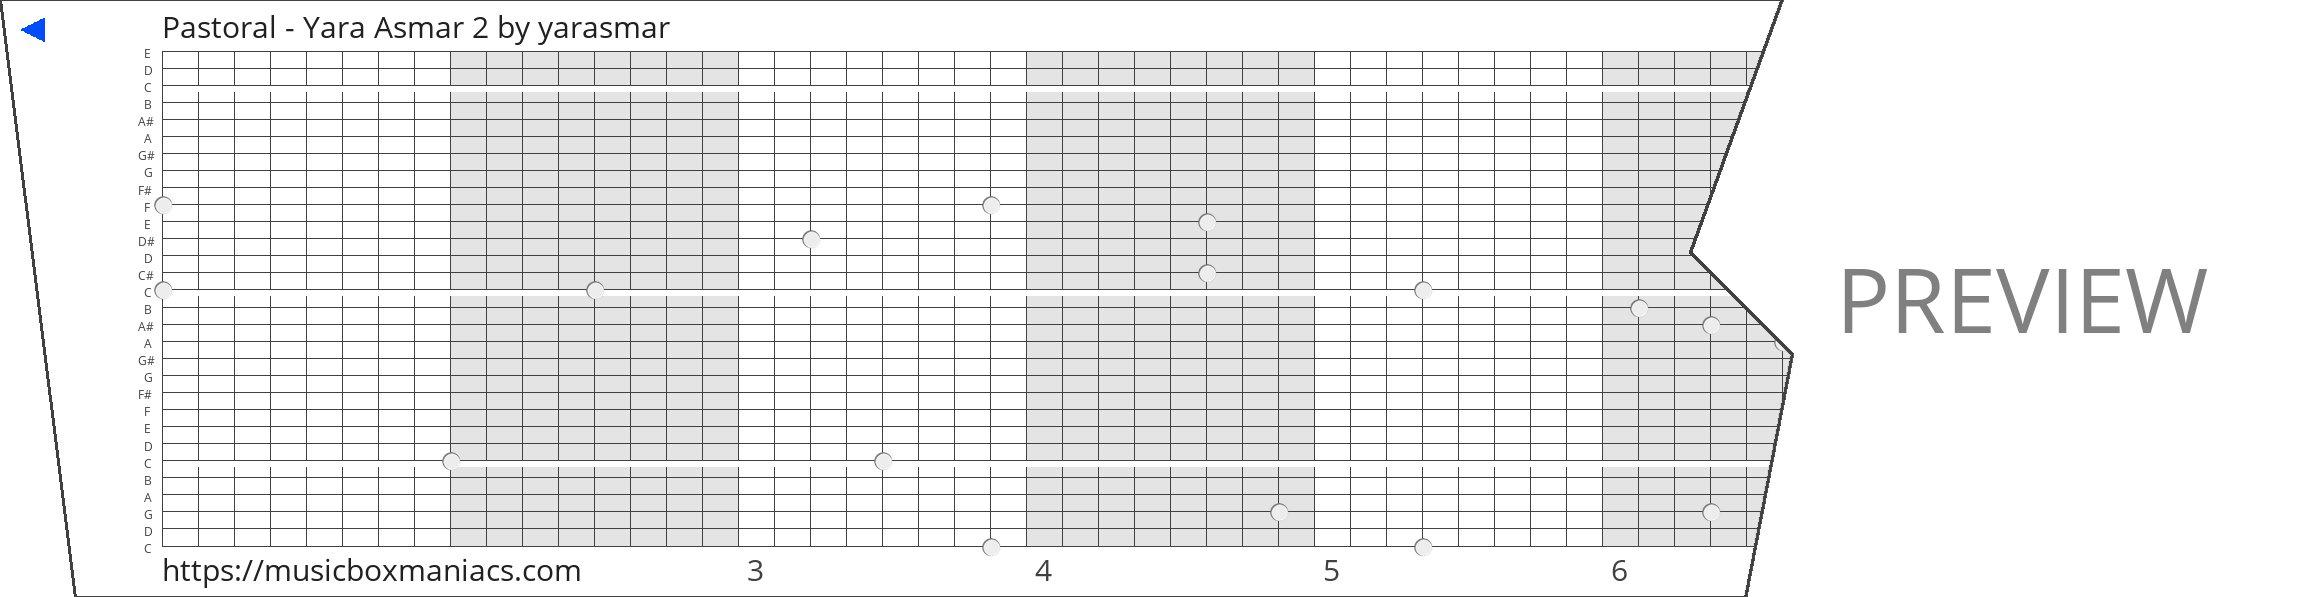 Pastoral - Yara Asmar 2 30 note music box paper strip